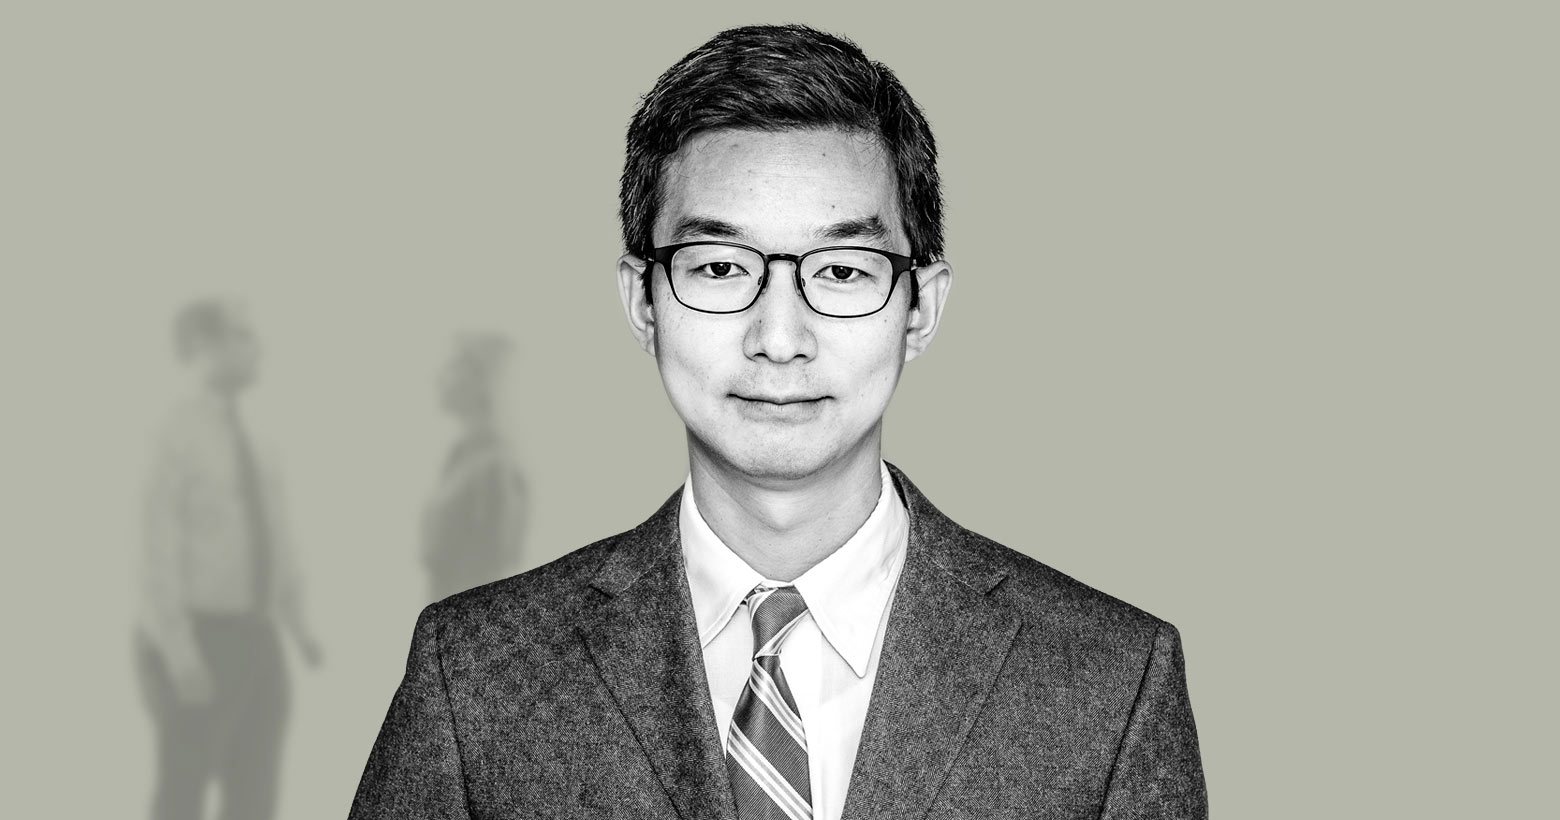 Jason A. Hwang